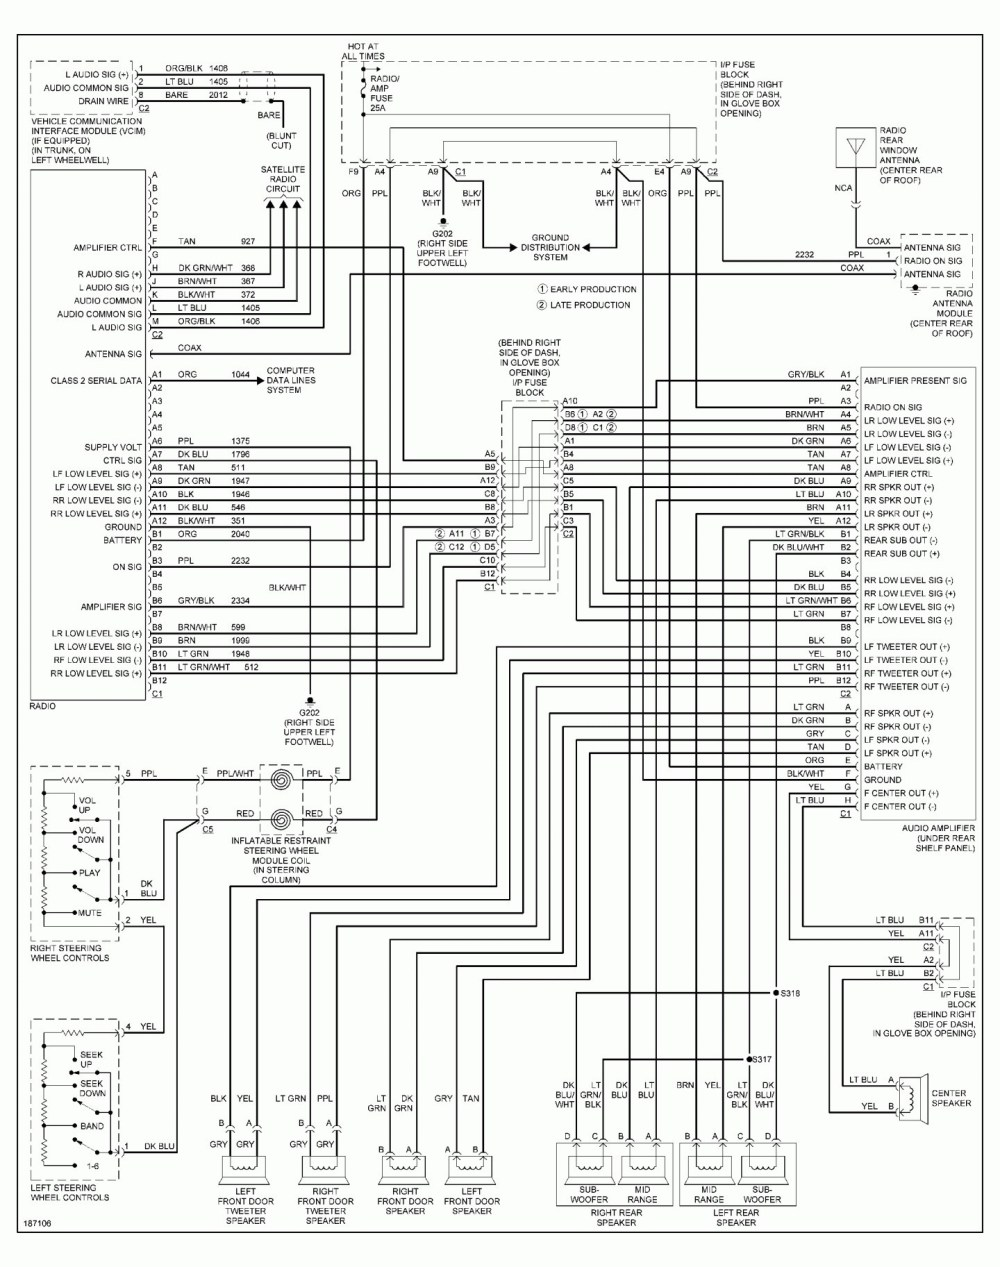 medium resolution of vw tiguan wiring diagram wiring library rh 45 mac happen de wiring diagram vw sharan wiring diagram vw transporter drawing